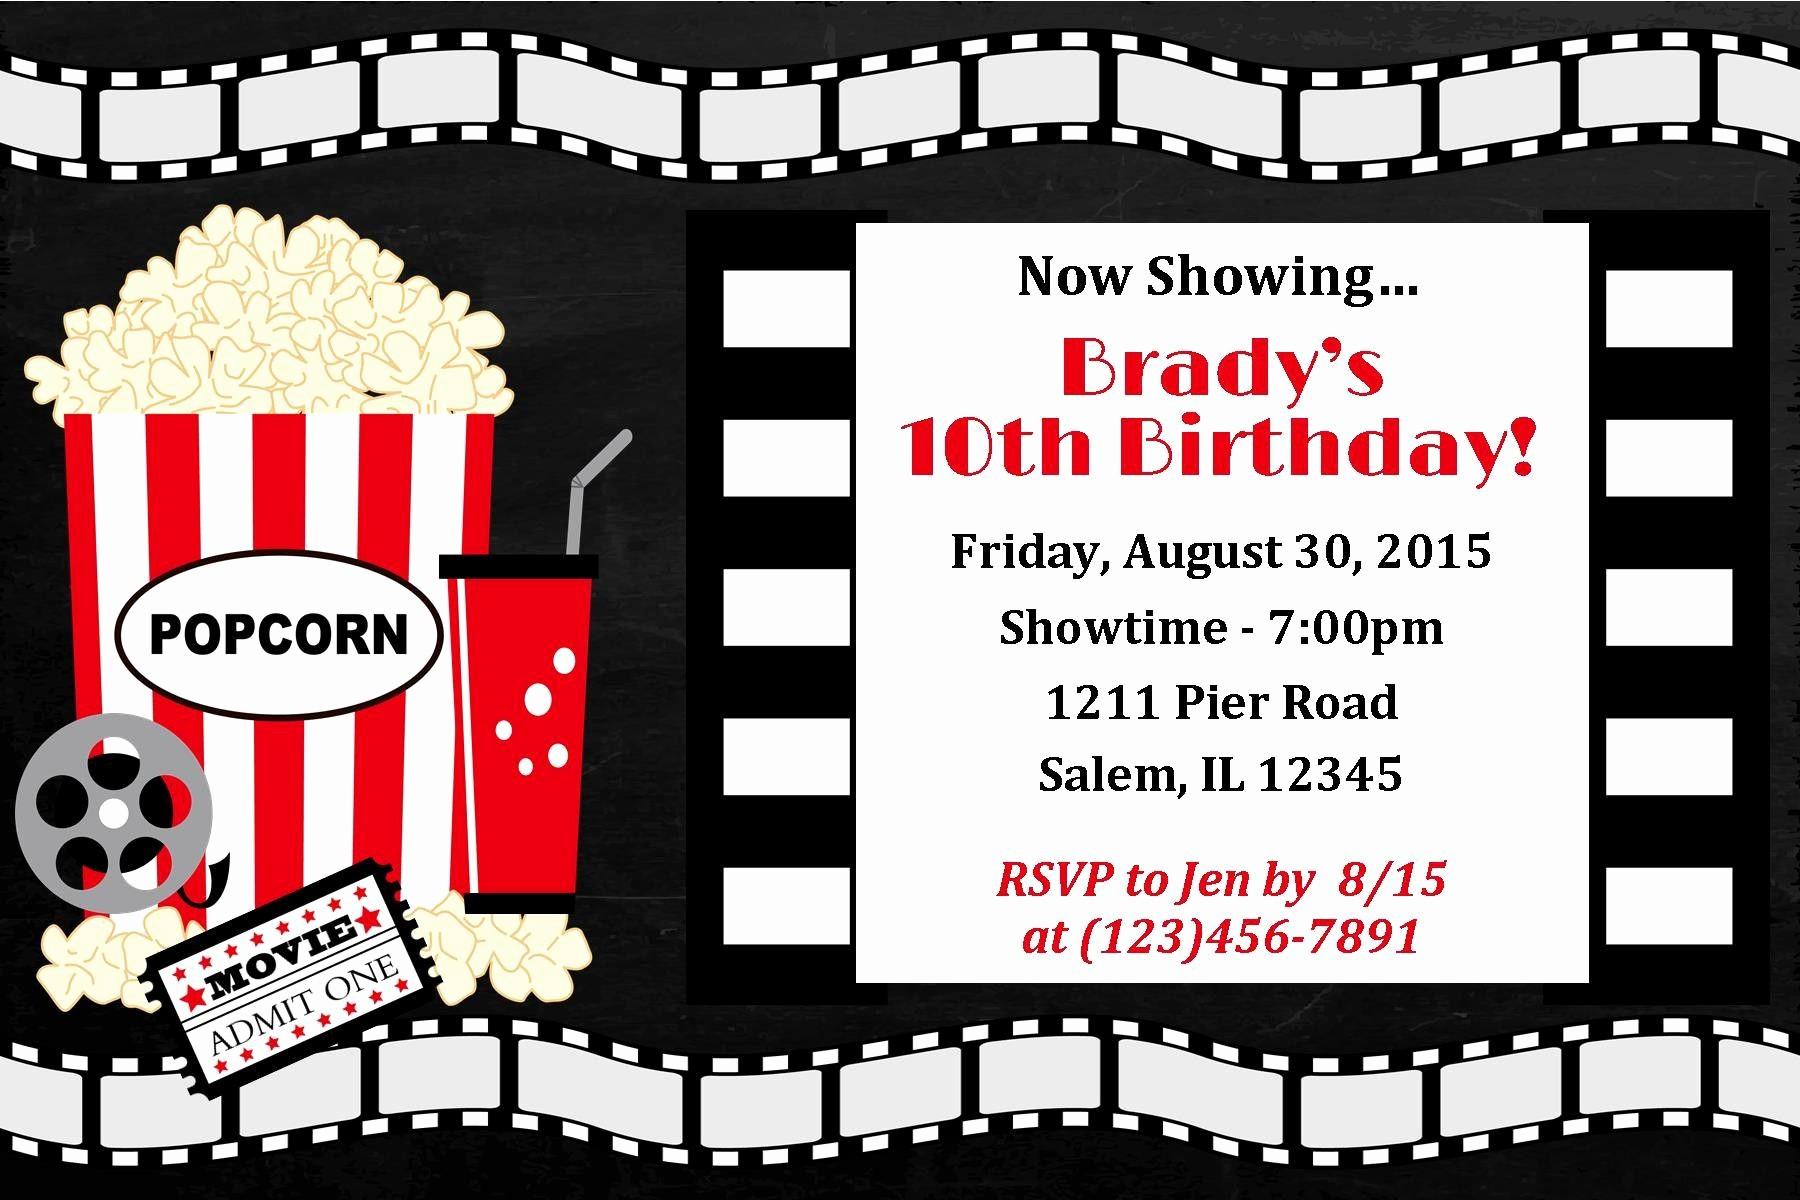 Movie themed Invitation Template Free Beautiful Einladung Geburtstag Kino Vorlage